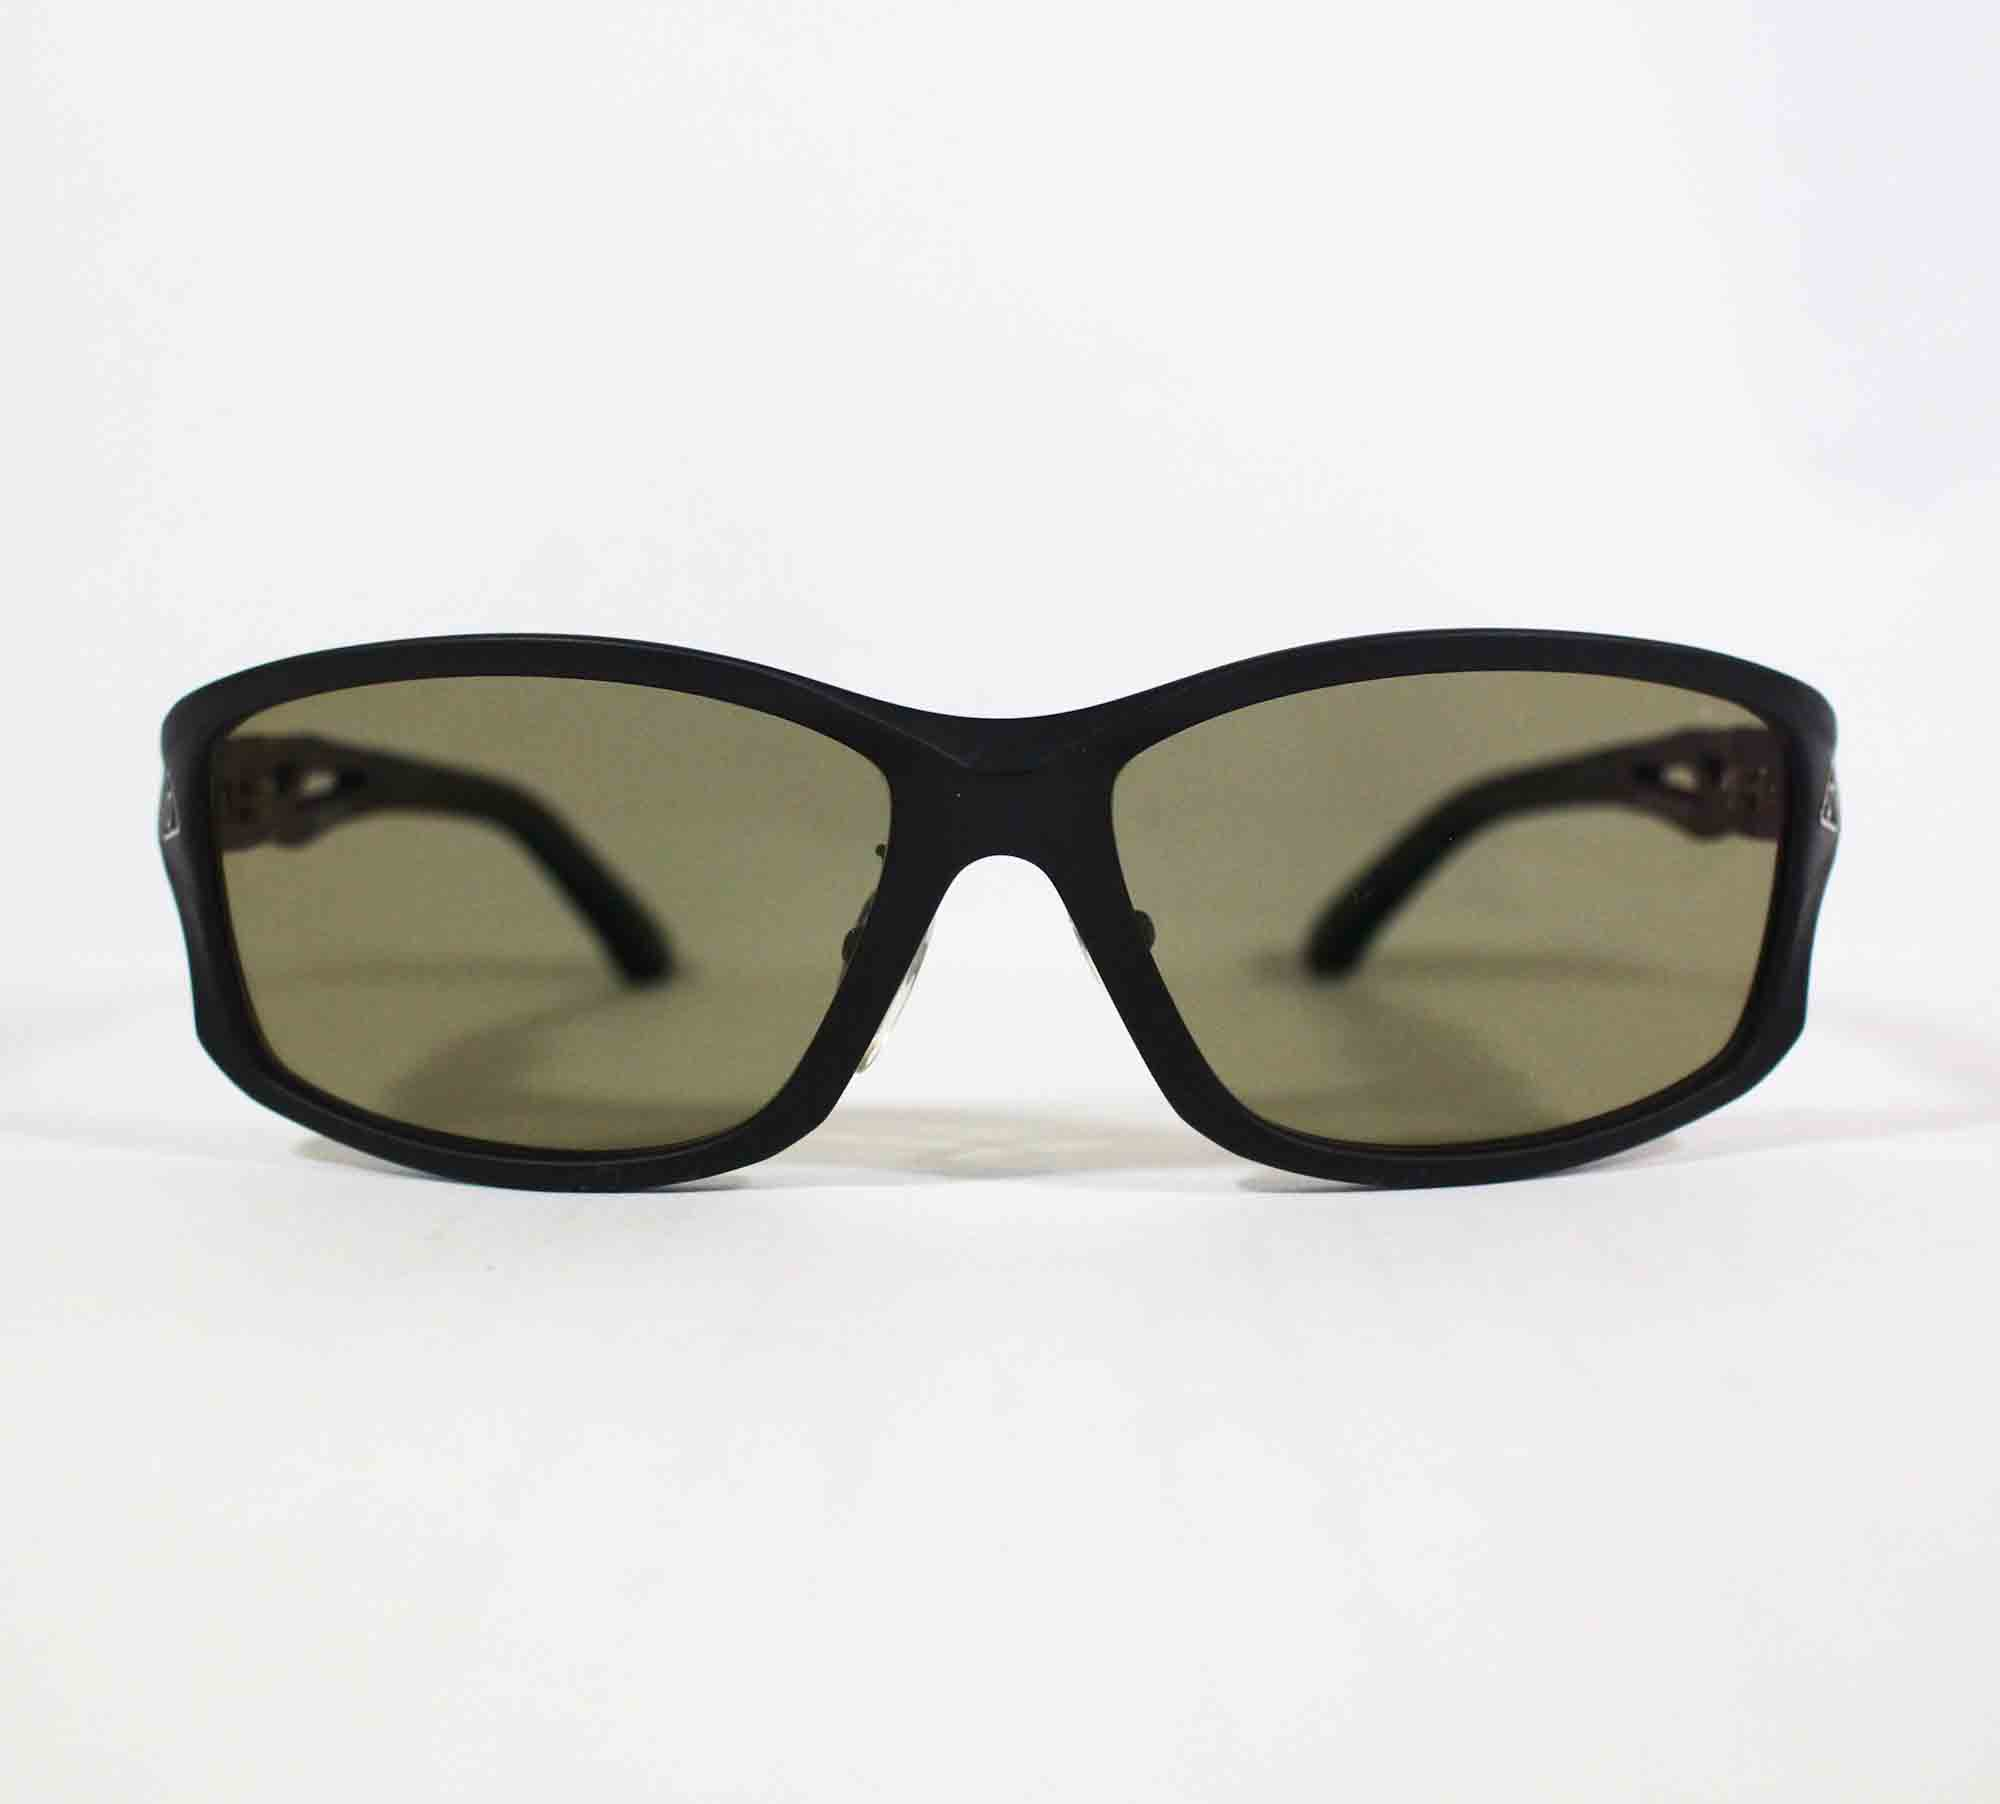 Zeque Polarised Fishing Sunglasses Stealth F-1920 True View Sports (8744)